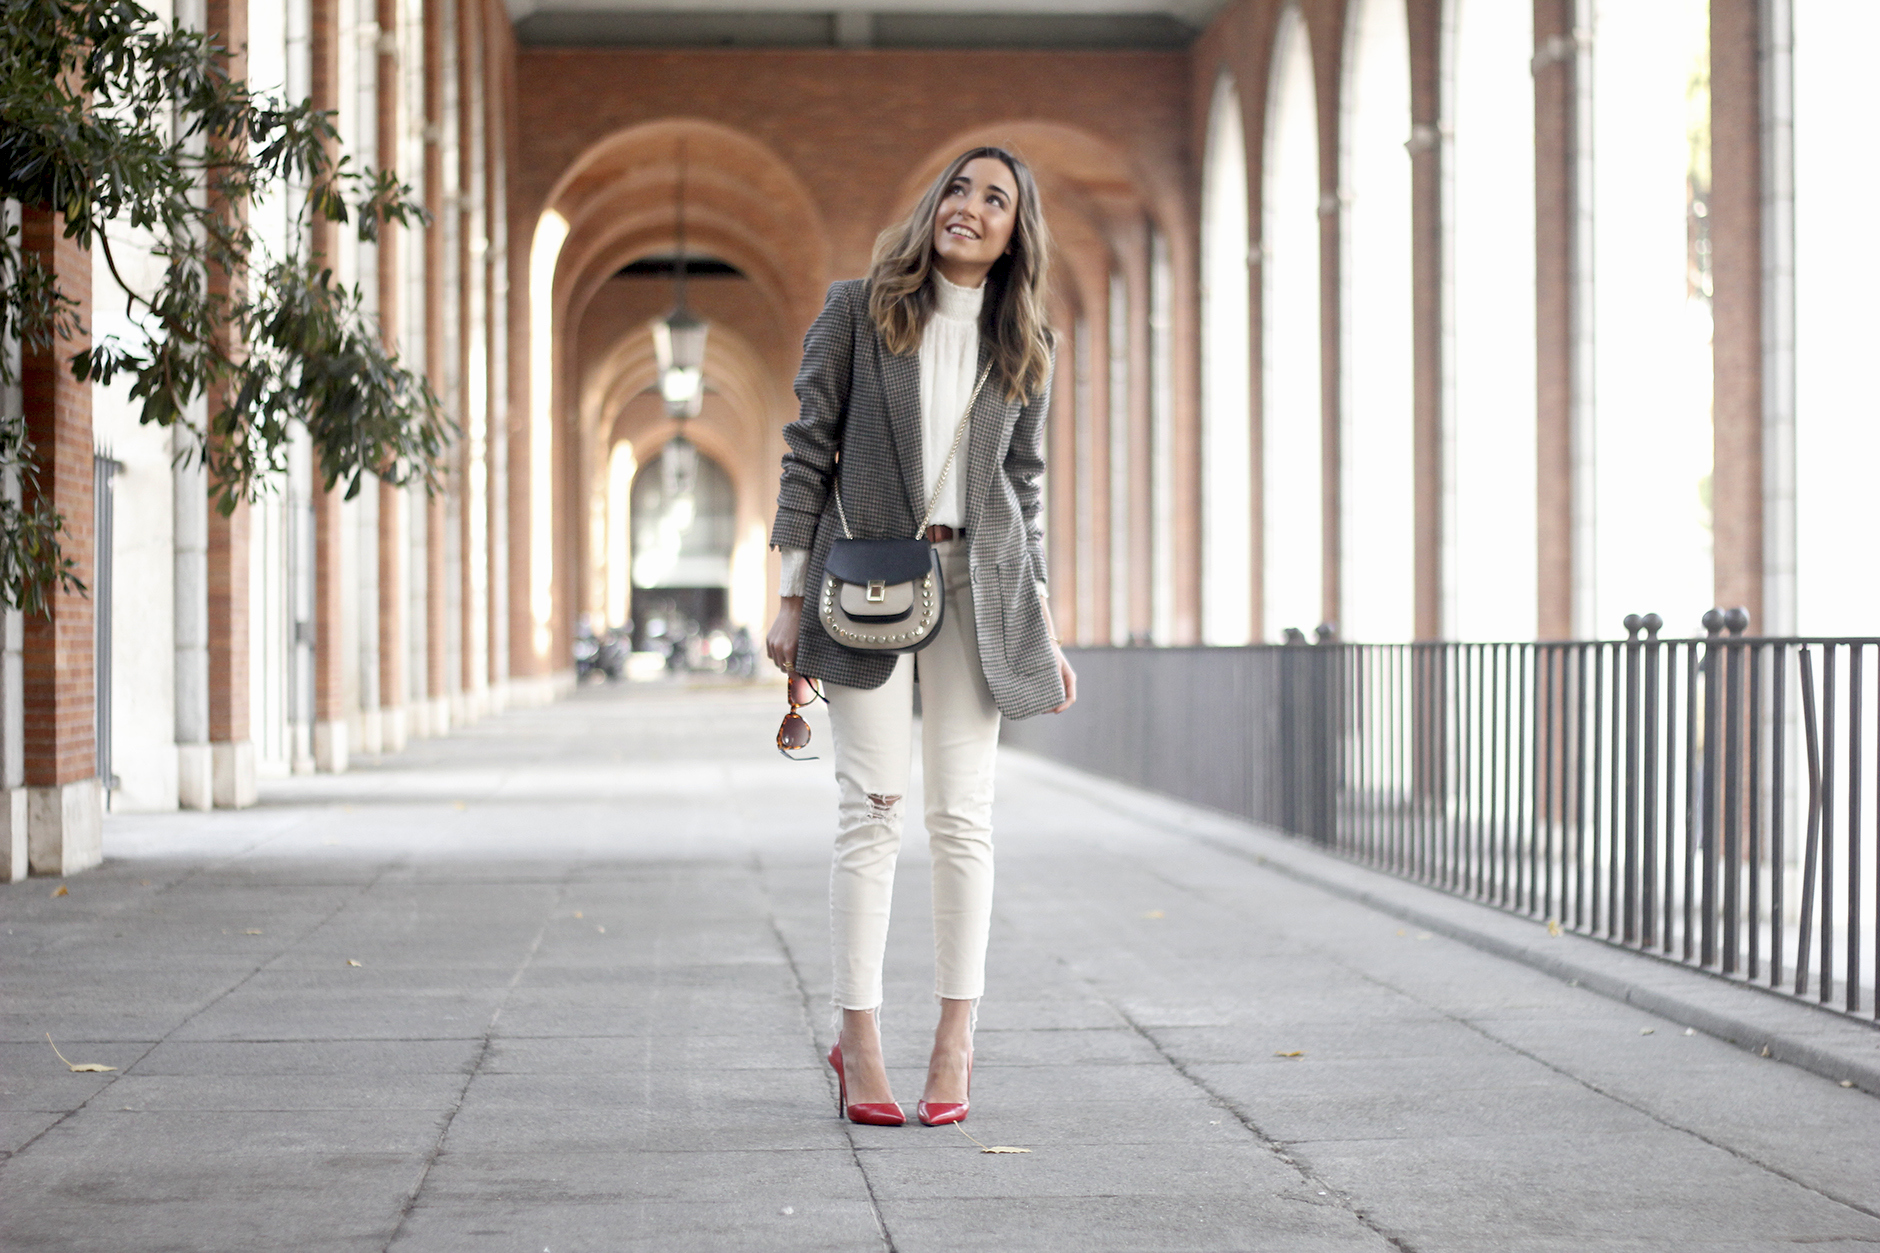 Plumeti blouse houndstooth blazer white jeans outfit style streetstyle17